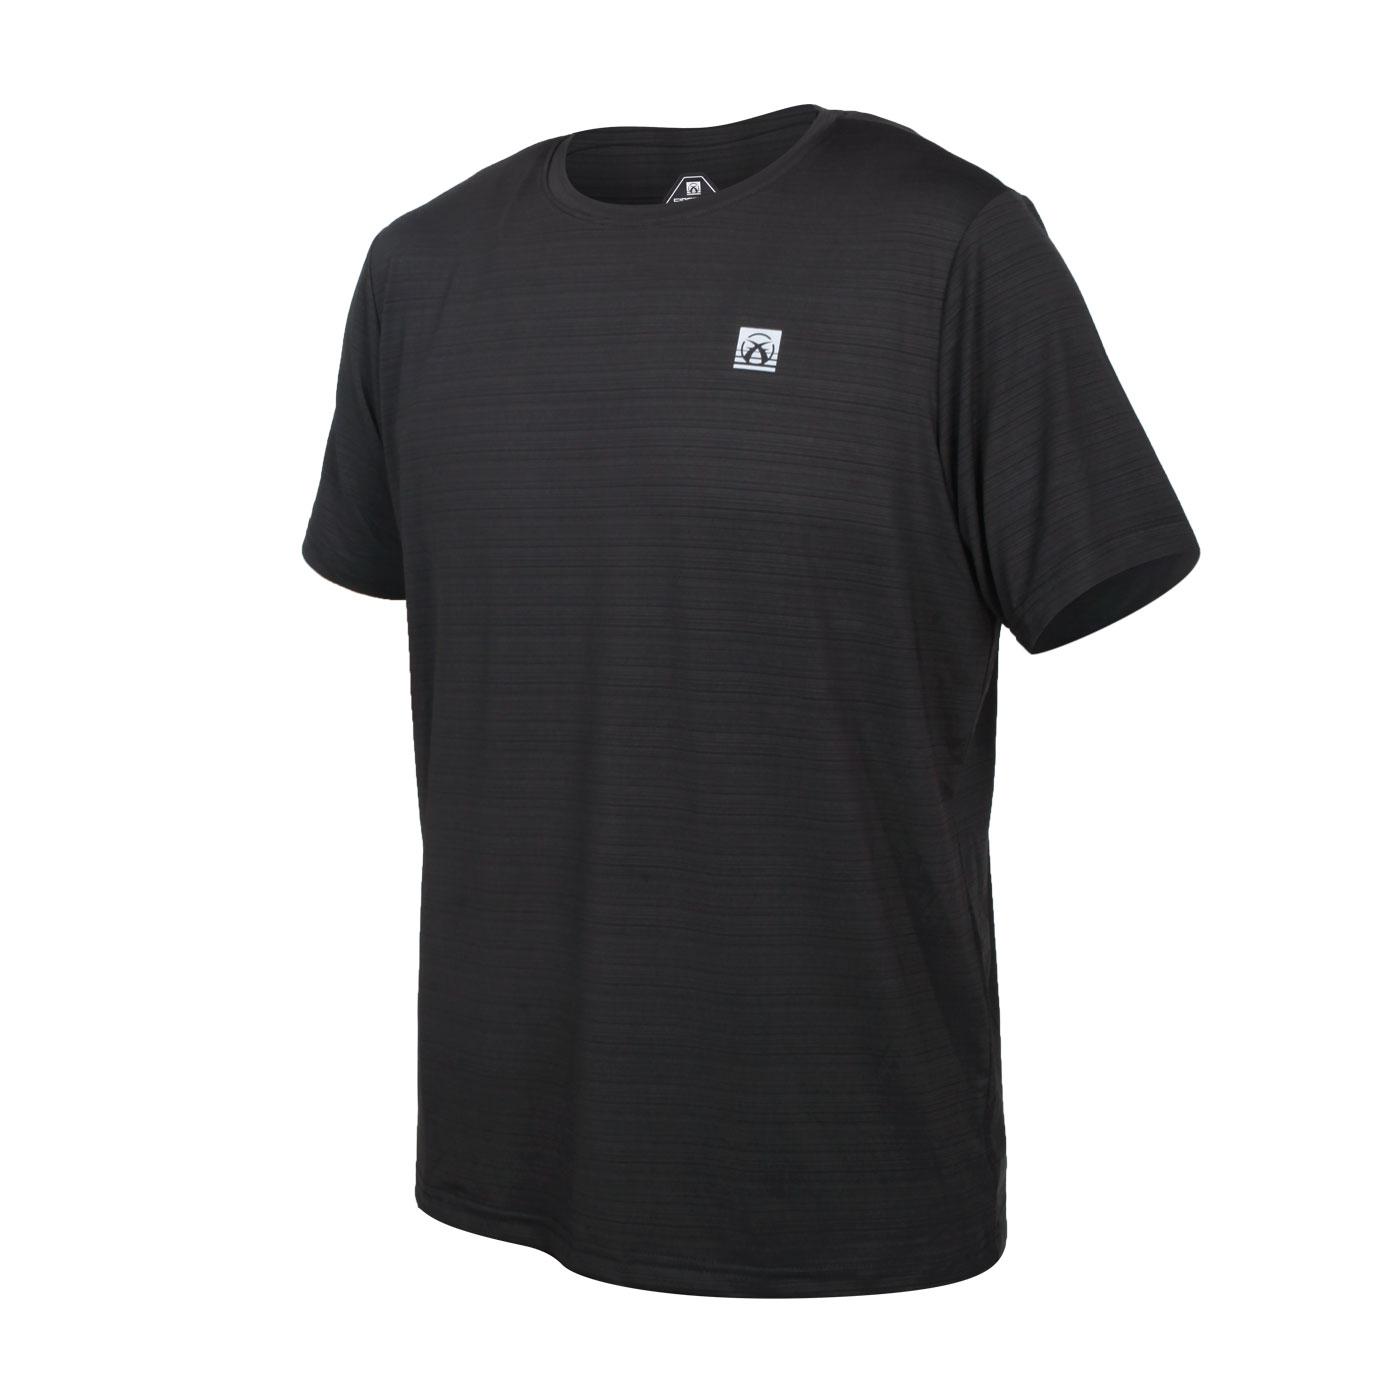 FIRESTAR 男彈性機能短袖圓領T恤 D1733-10